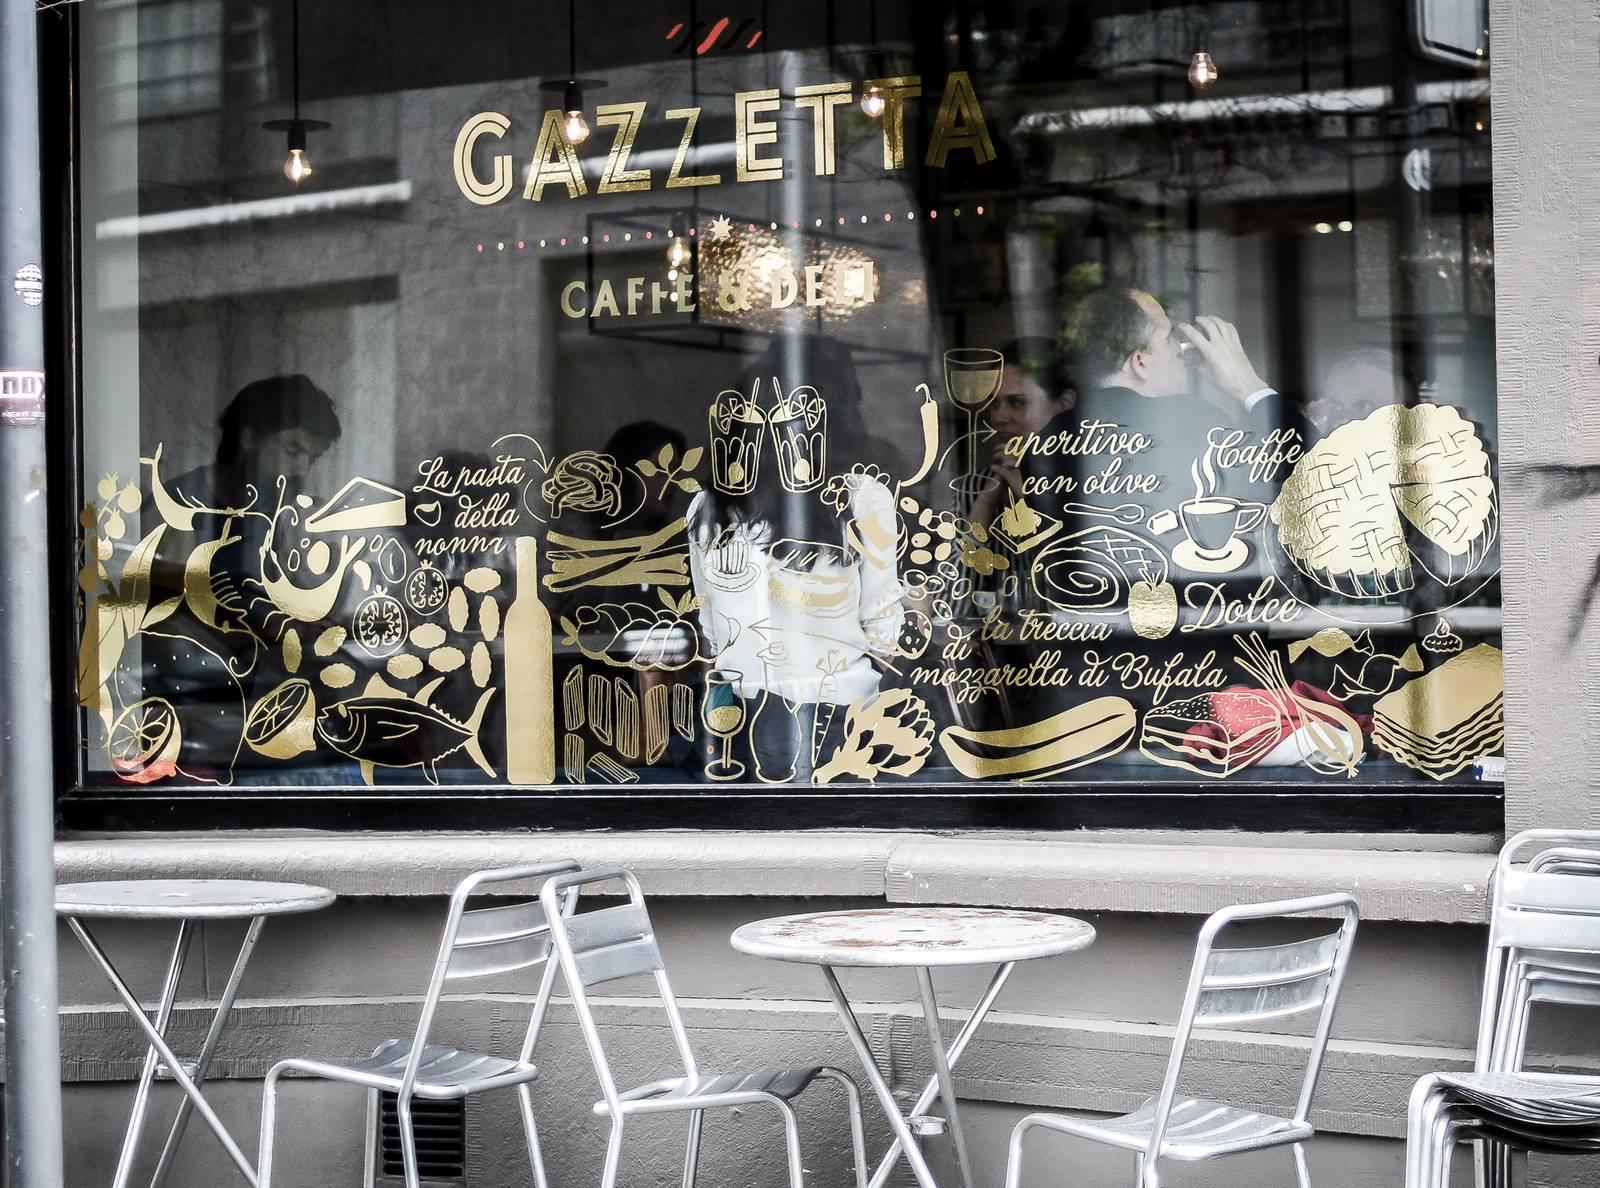 La Gazetta Bruxelles